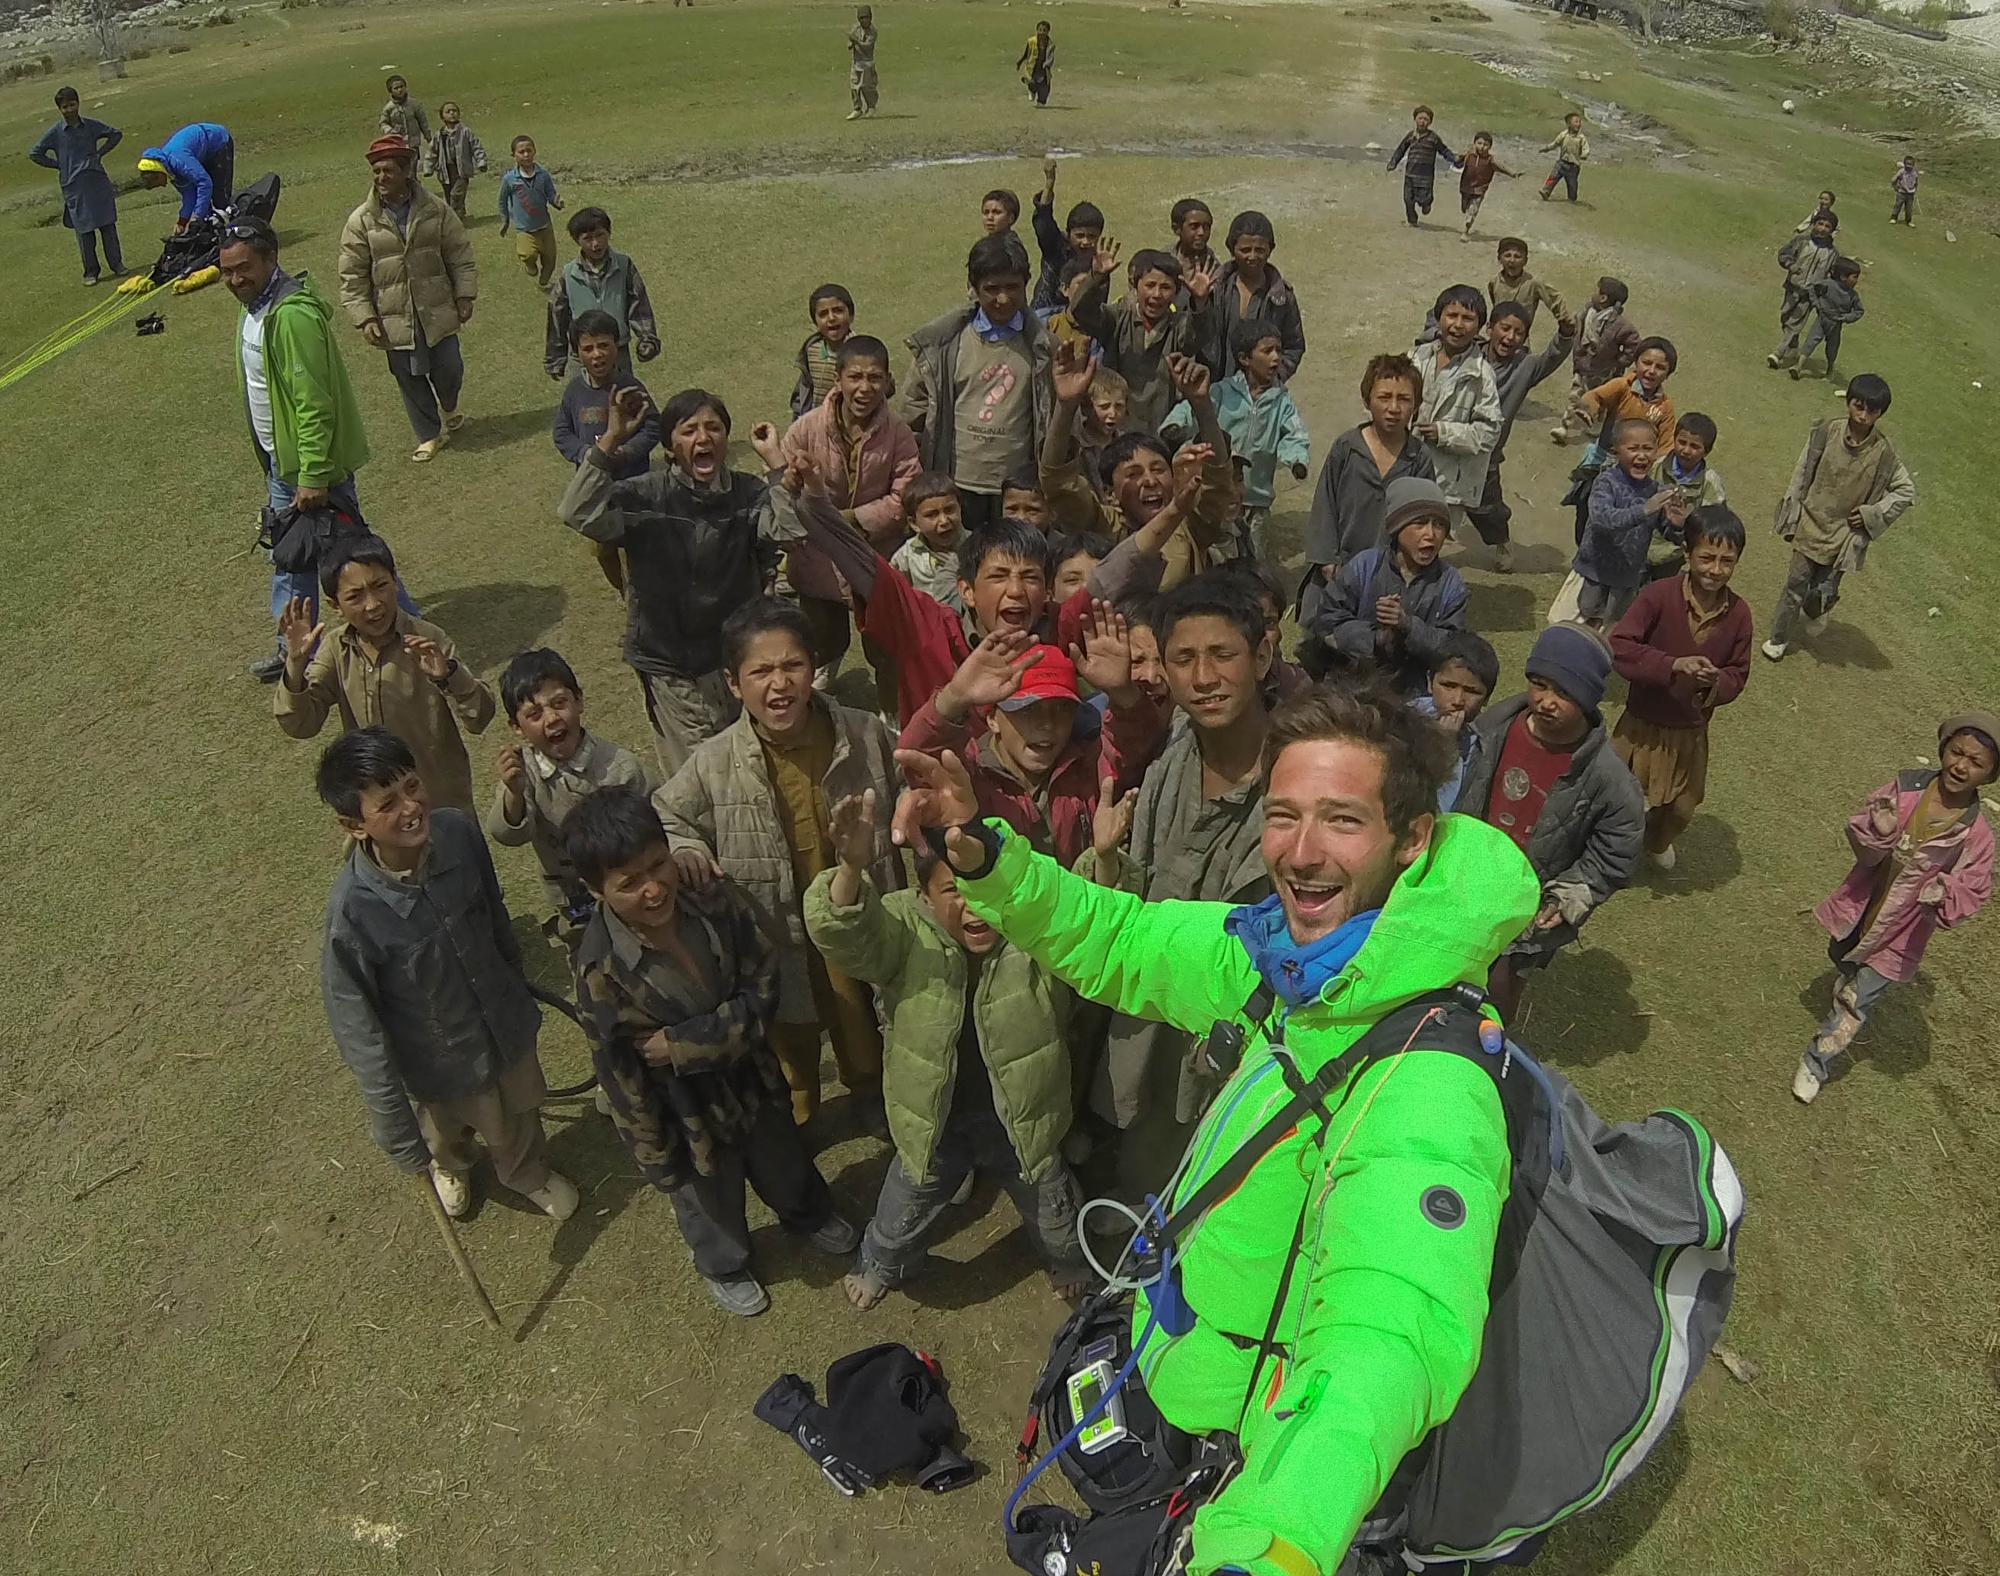 Pakistan expe Karakoram Ragolski Francois Ovcharov Veso Loncar Petar Shams Hushe Kids landing